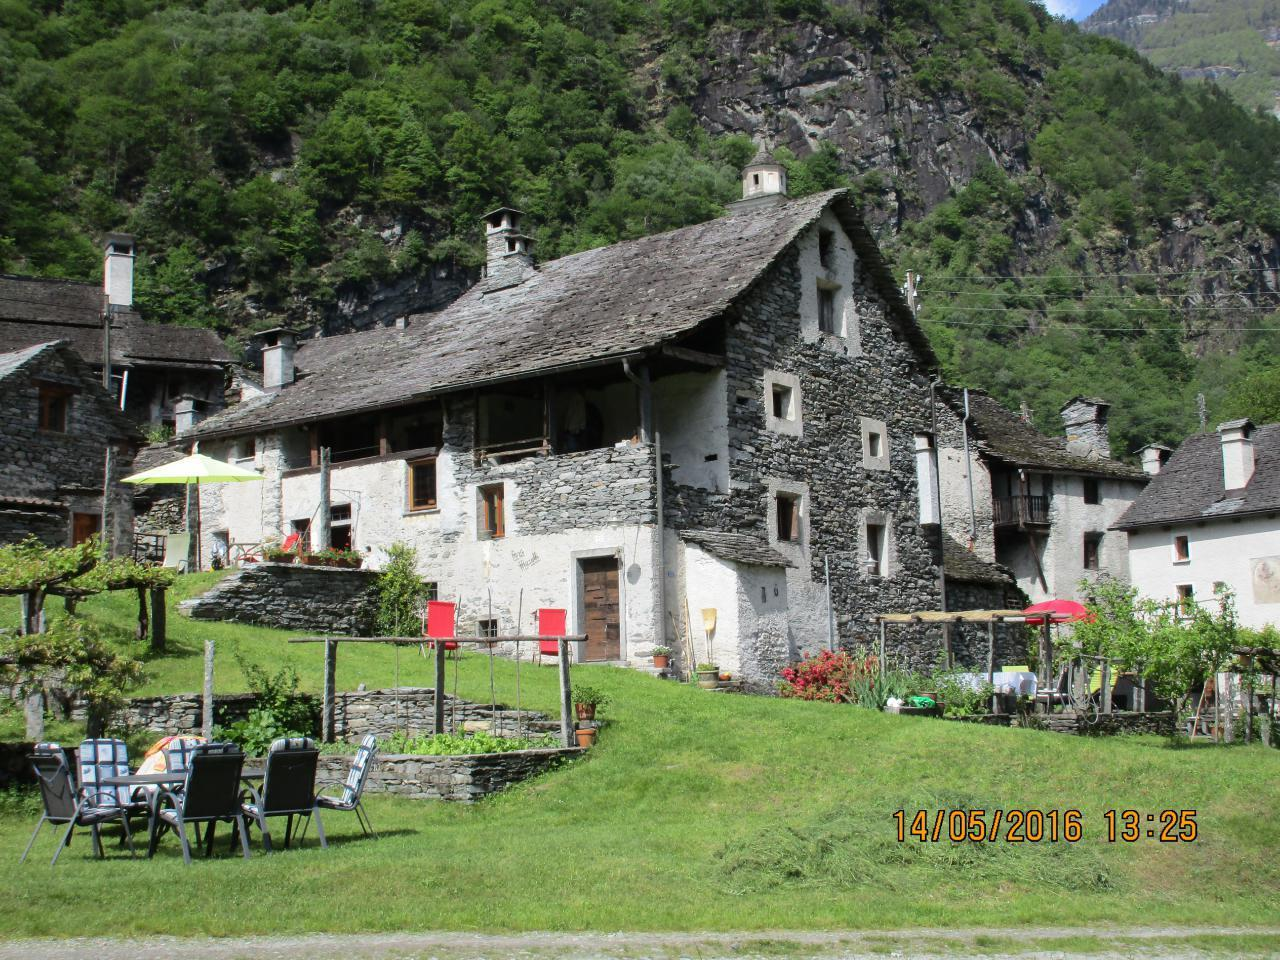 Ferienwohnung Rustico Casa Moretti (1933305), Cevio, Maggiatal, Tessin, Schweiz, Bild 1